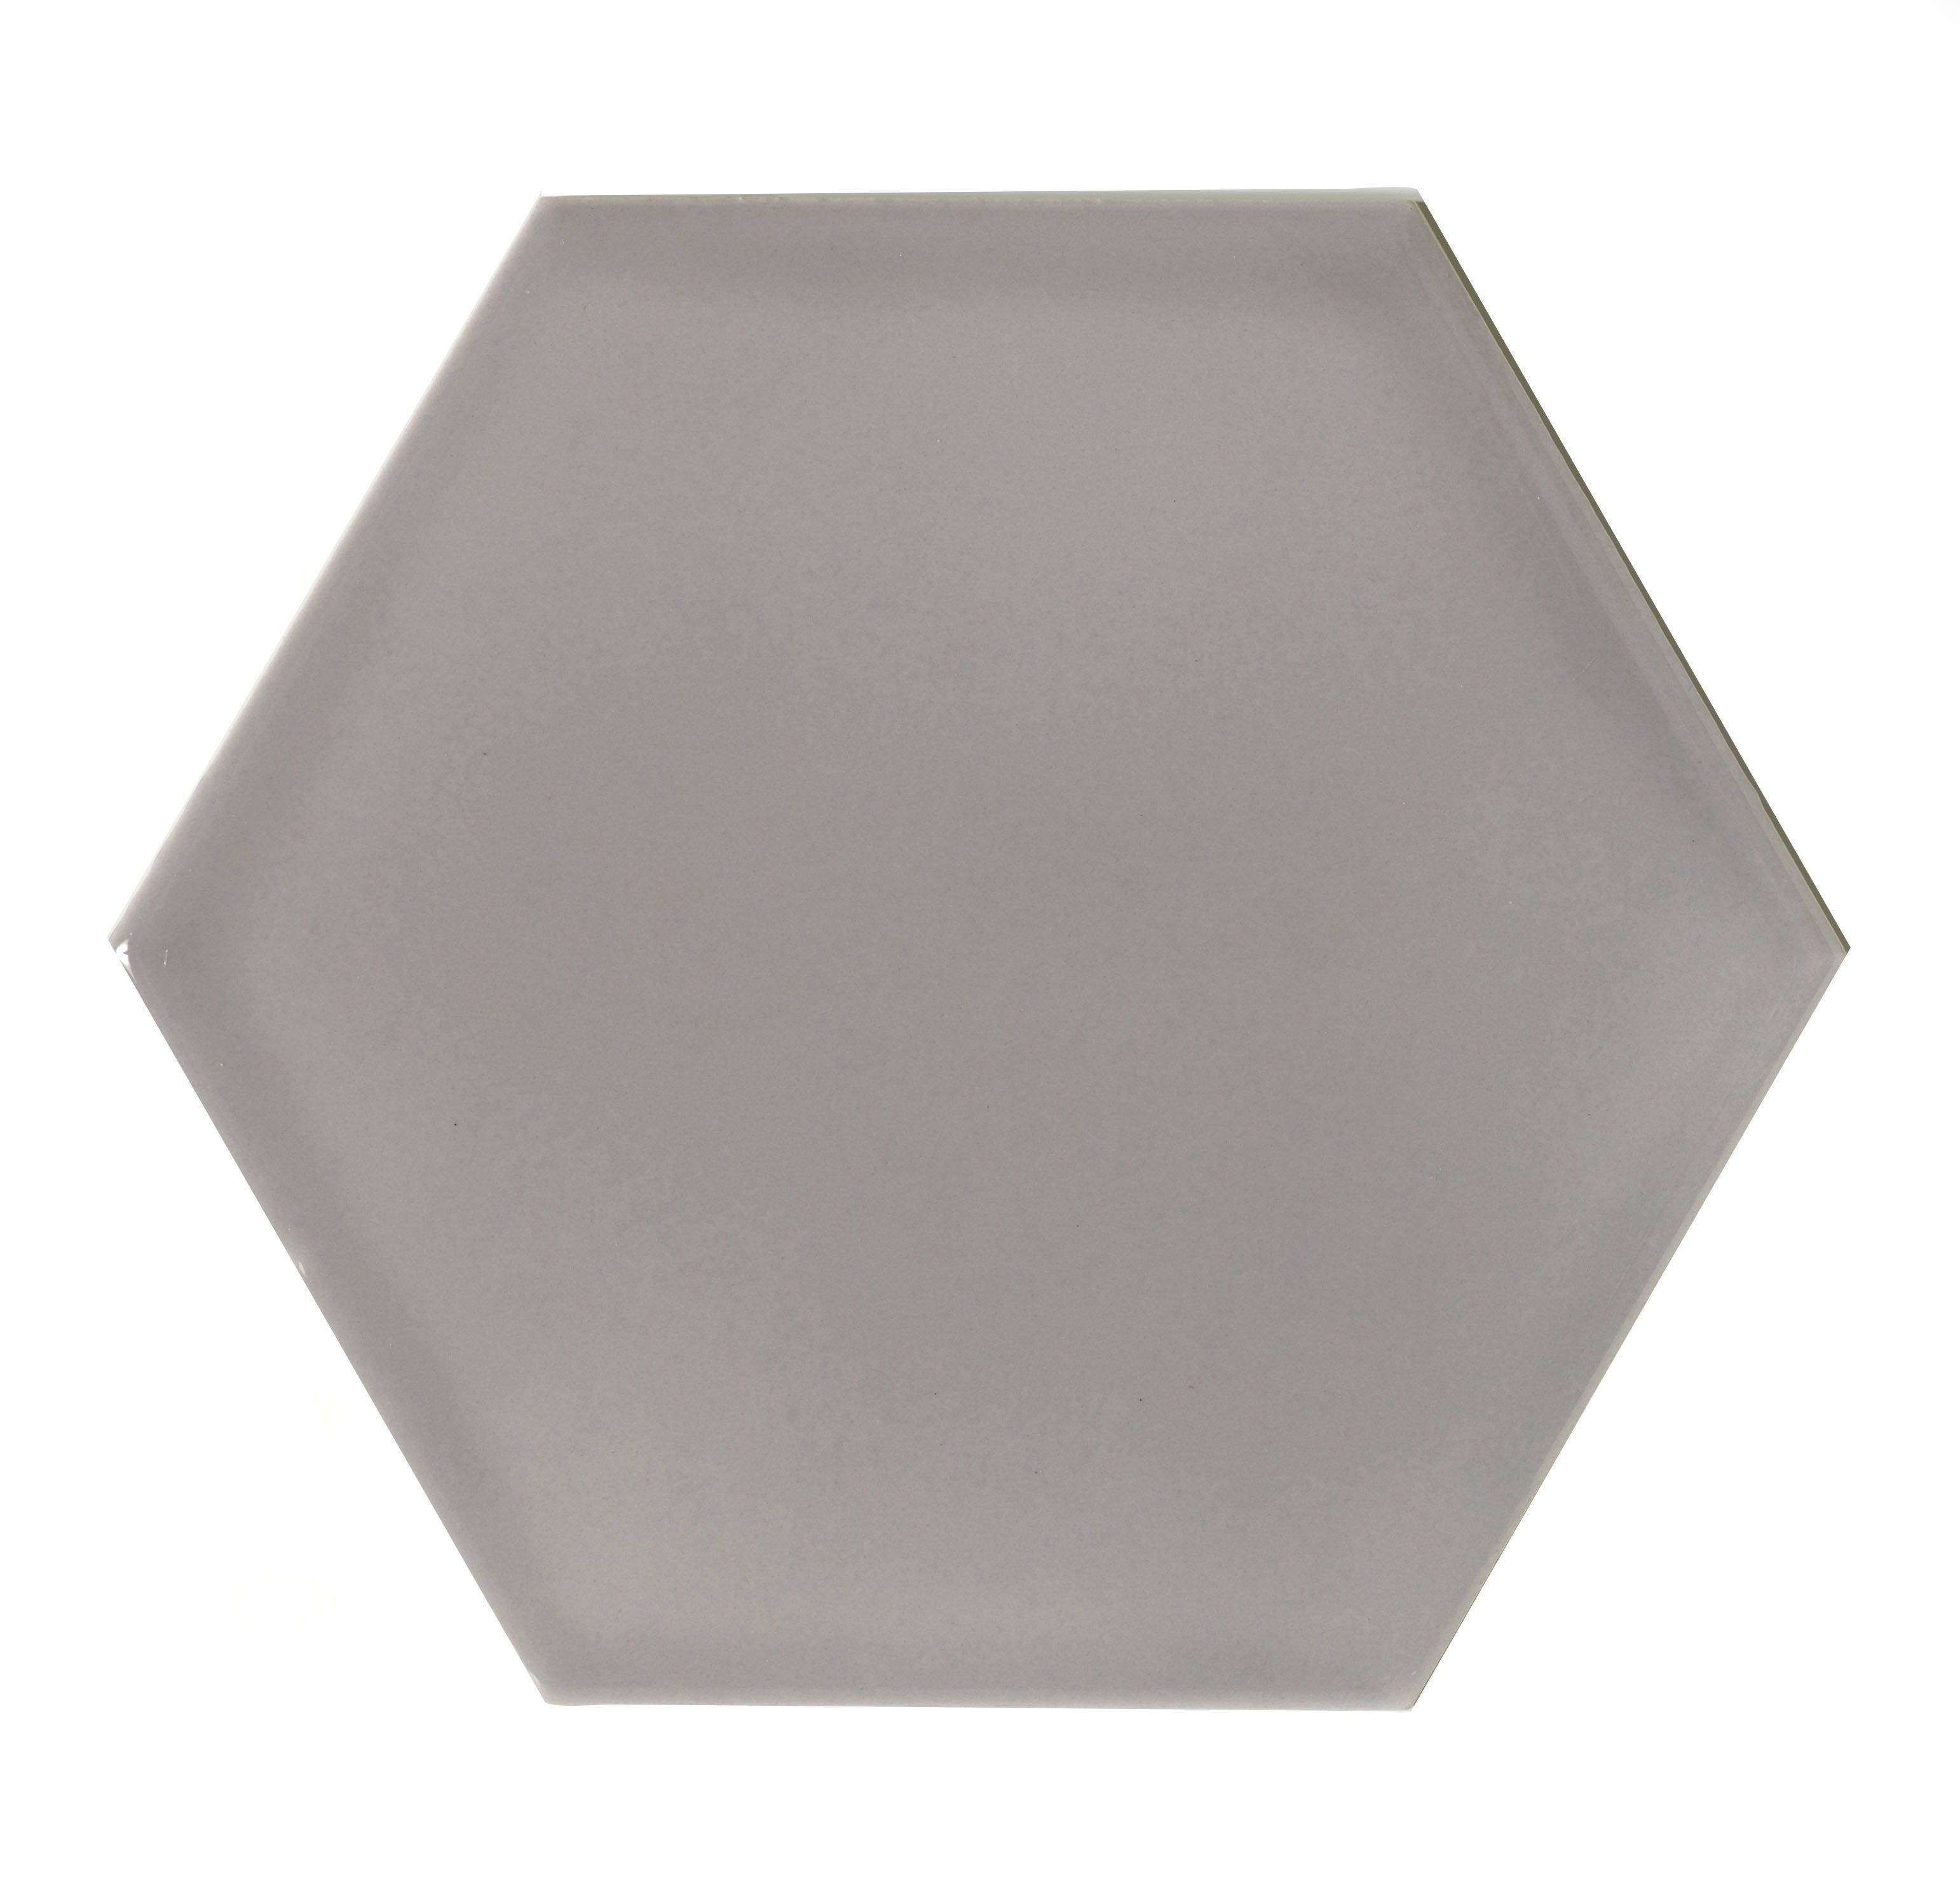 Bq Ceramic Kitchen Floor Tiles Hanbury Steel Hexagon Ceramic Wall Tile Pack Of 50 L150mm W